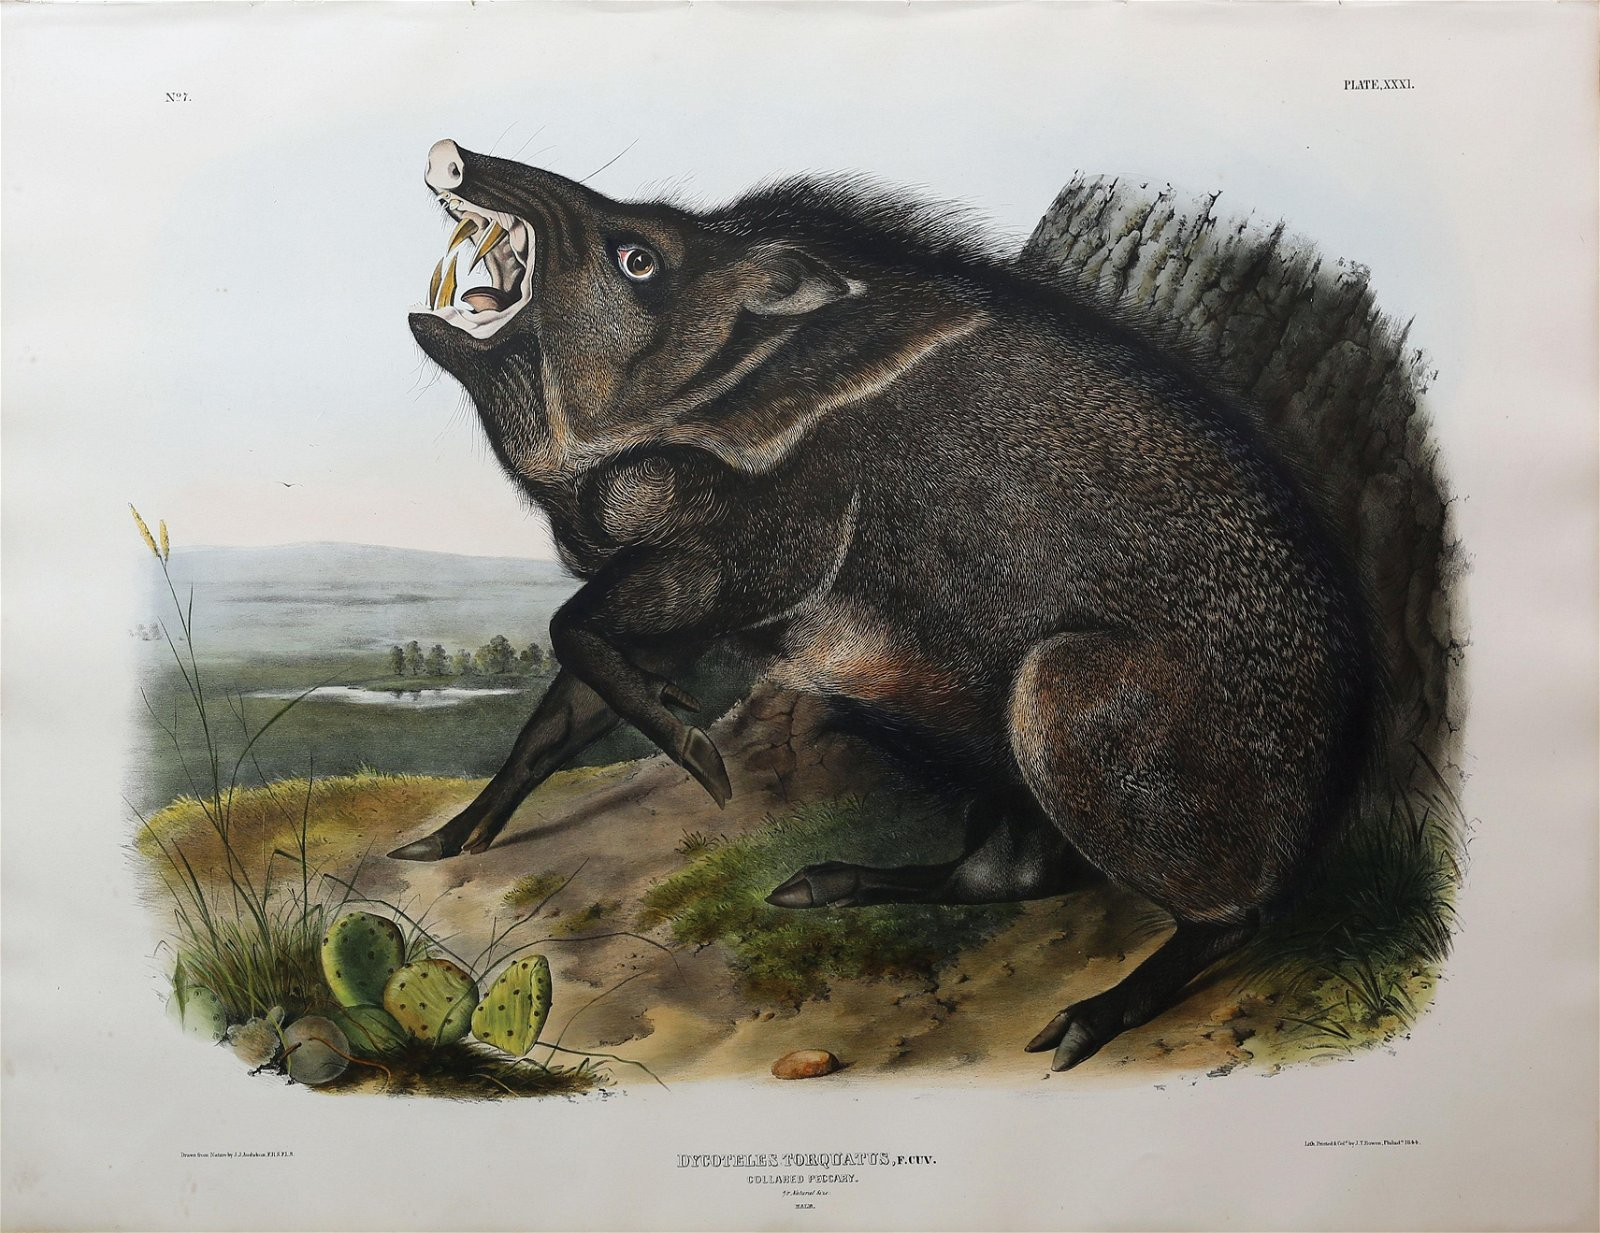 Audubon Lithograph, Collared Peccary